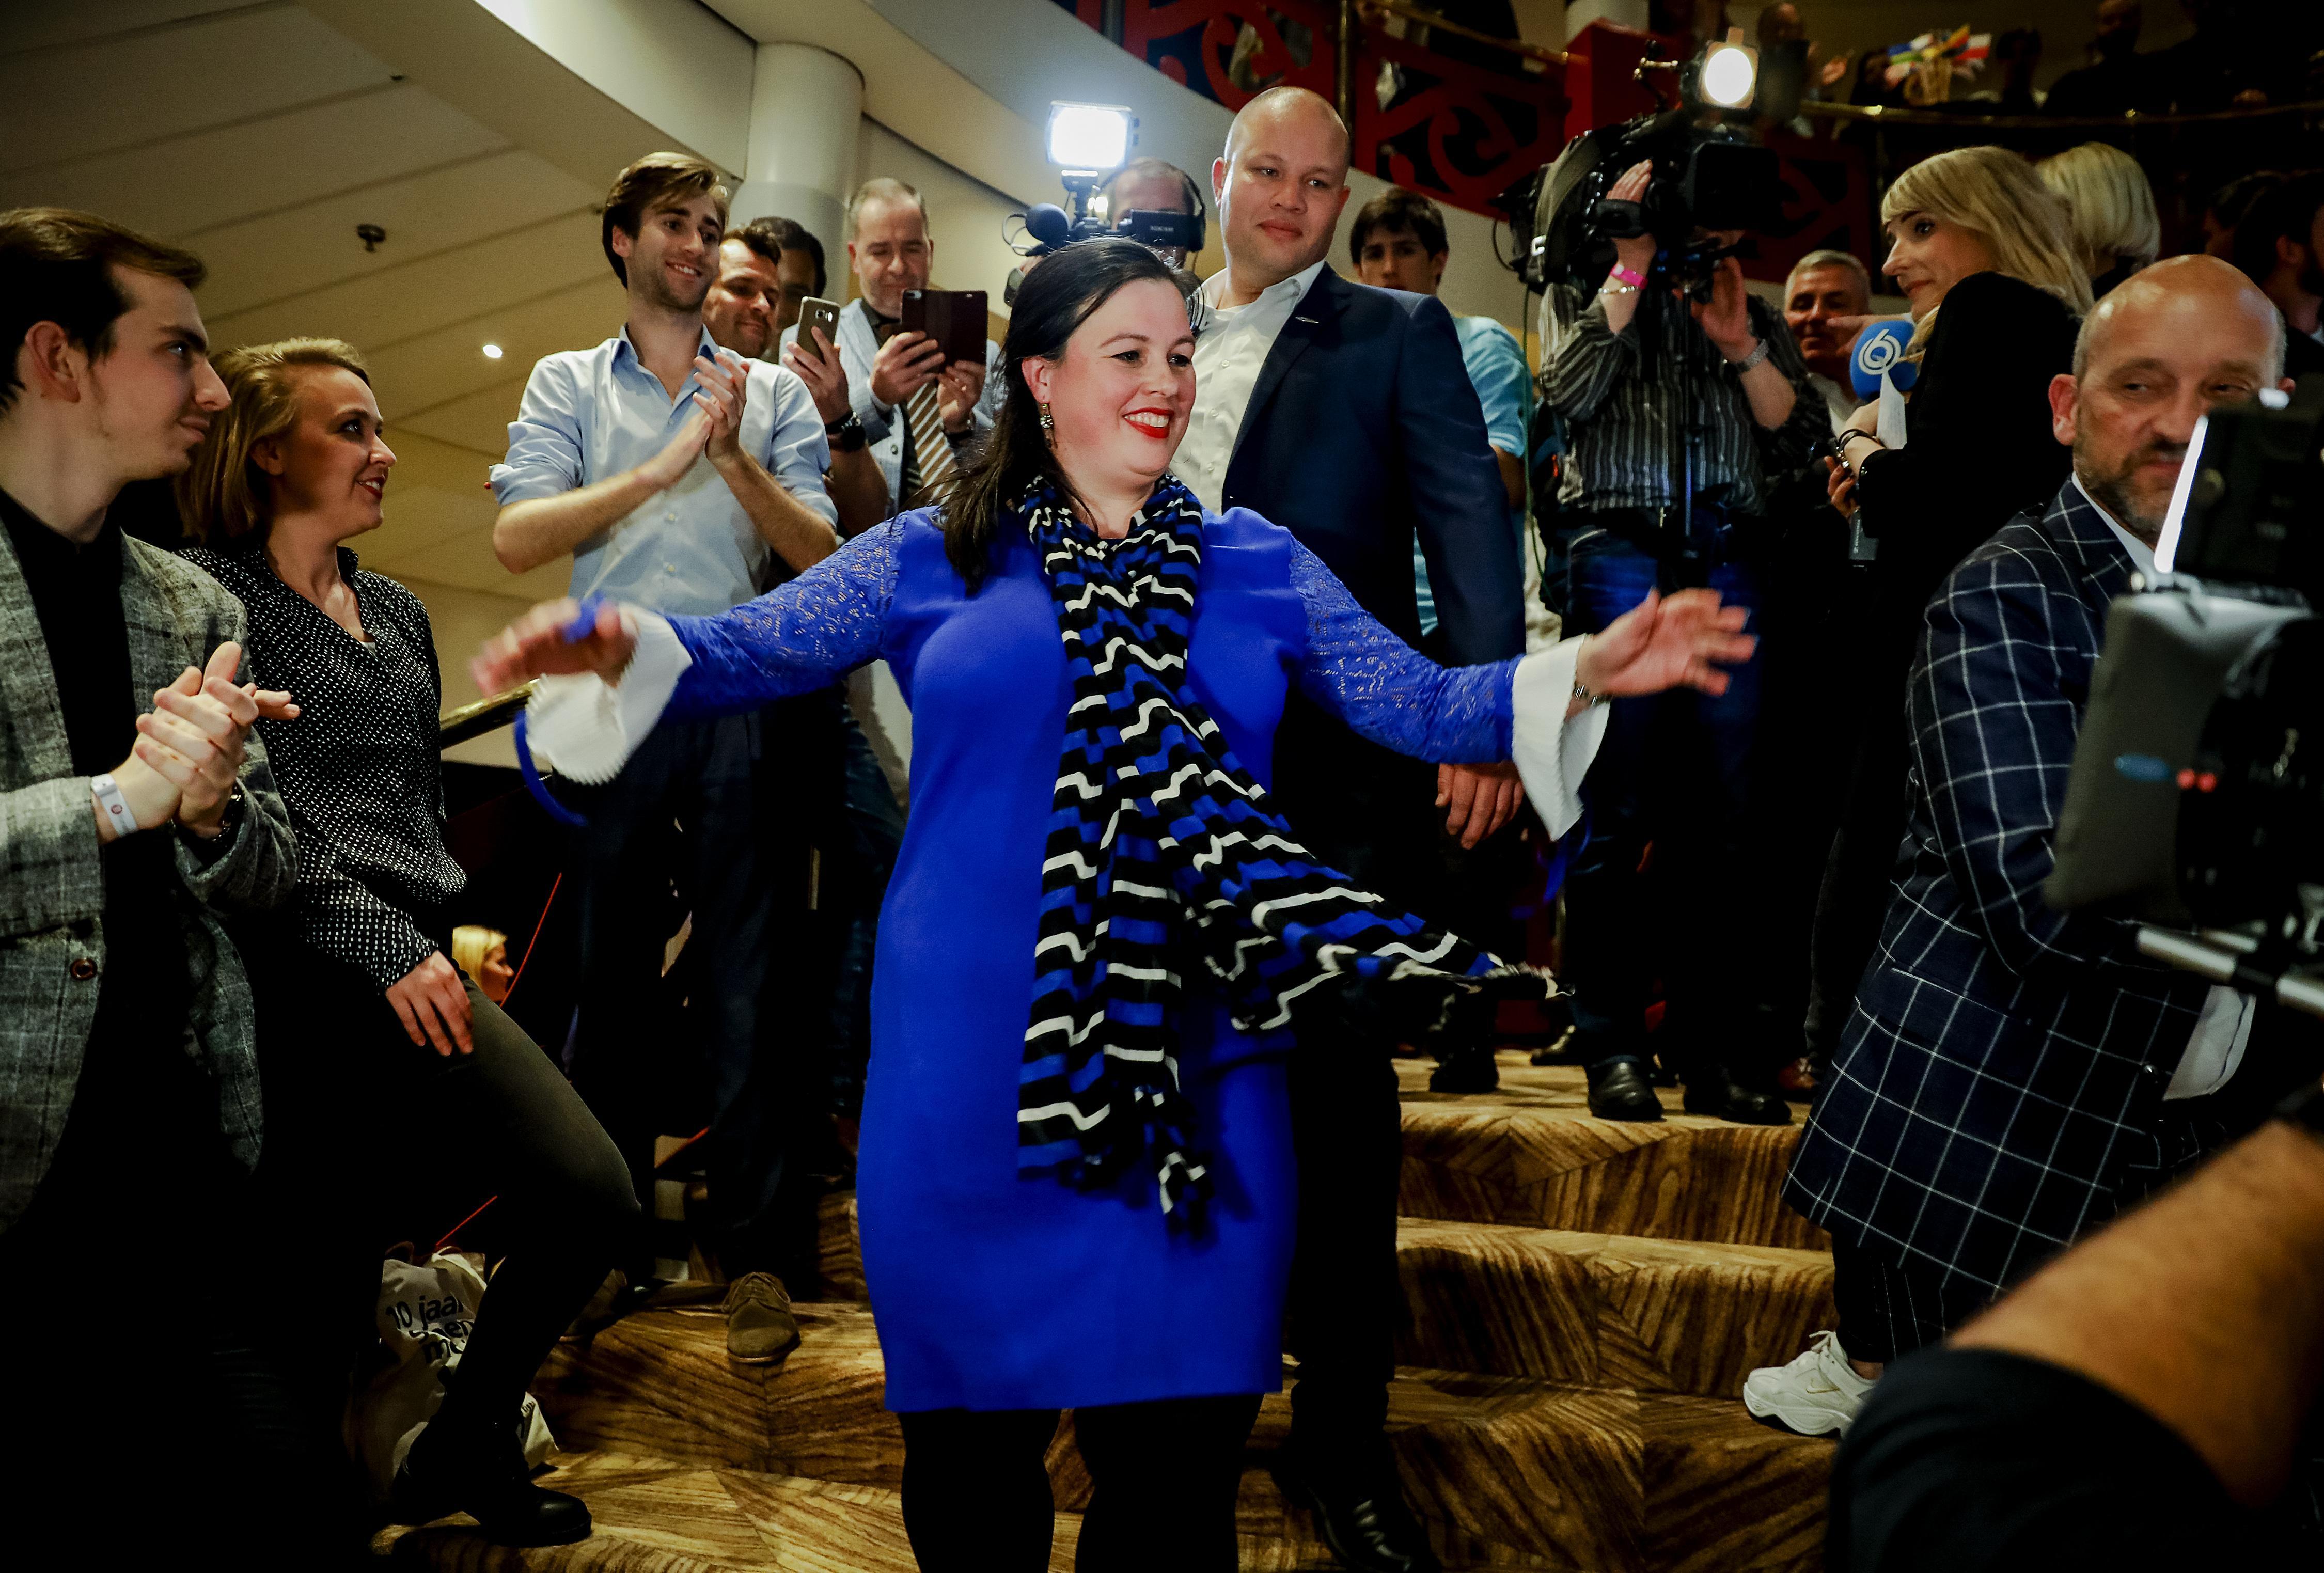 Baudet wordt geen Statenlid, Nanninga wel, in Noord-Holland